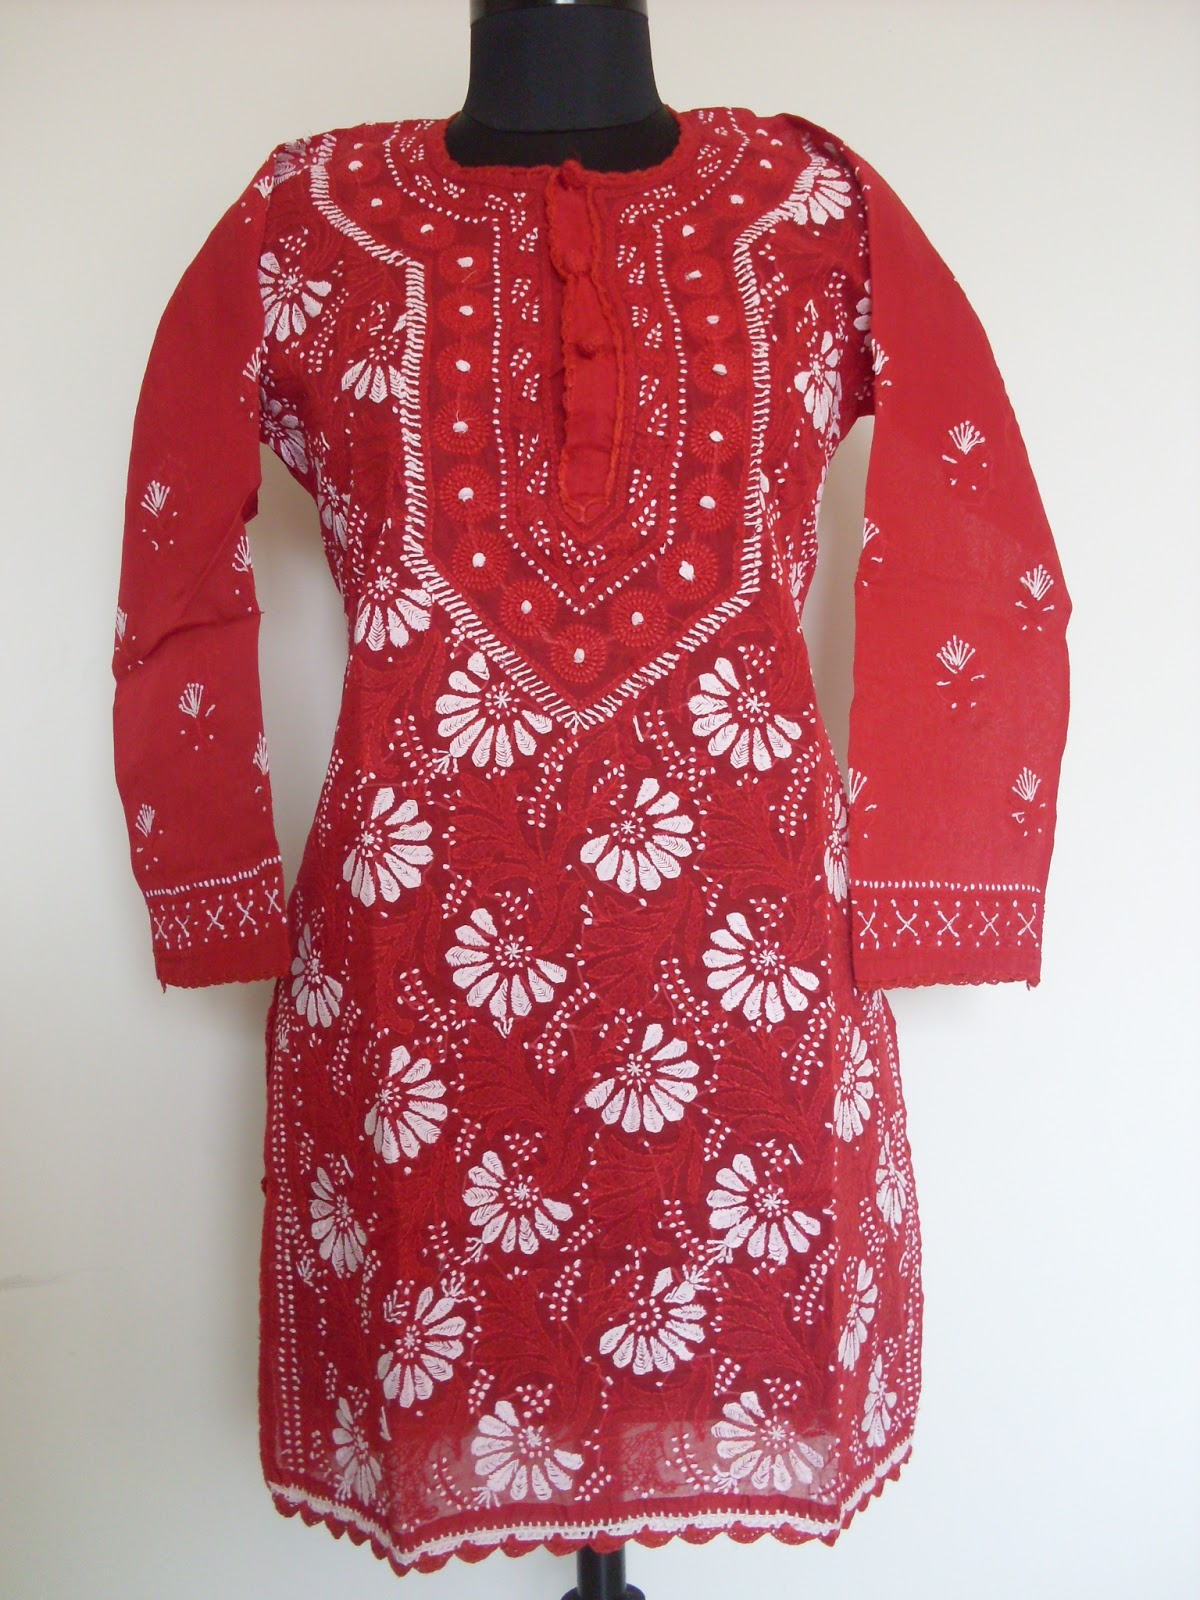 Trendy Kurti Patterns With Hand Embroidery In Chikankari